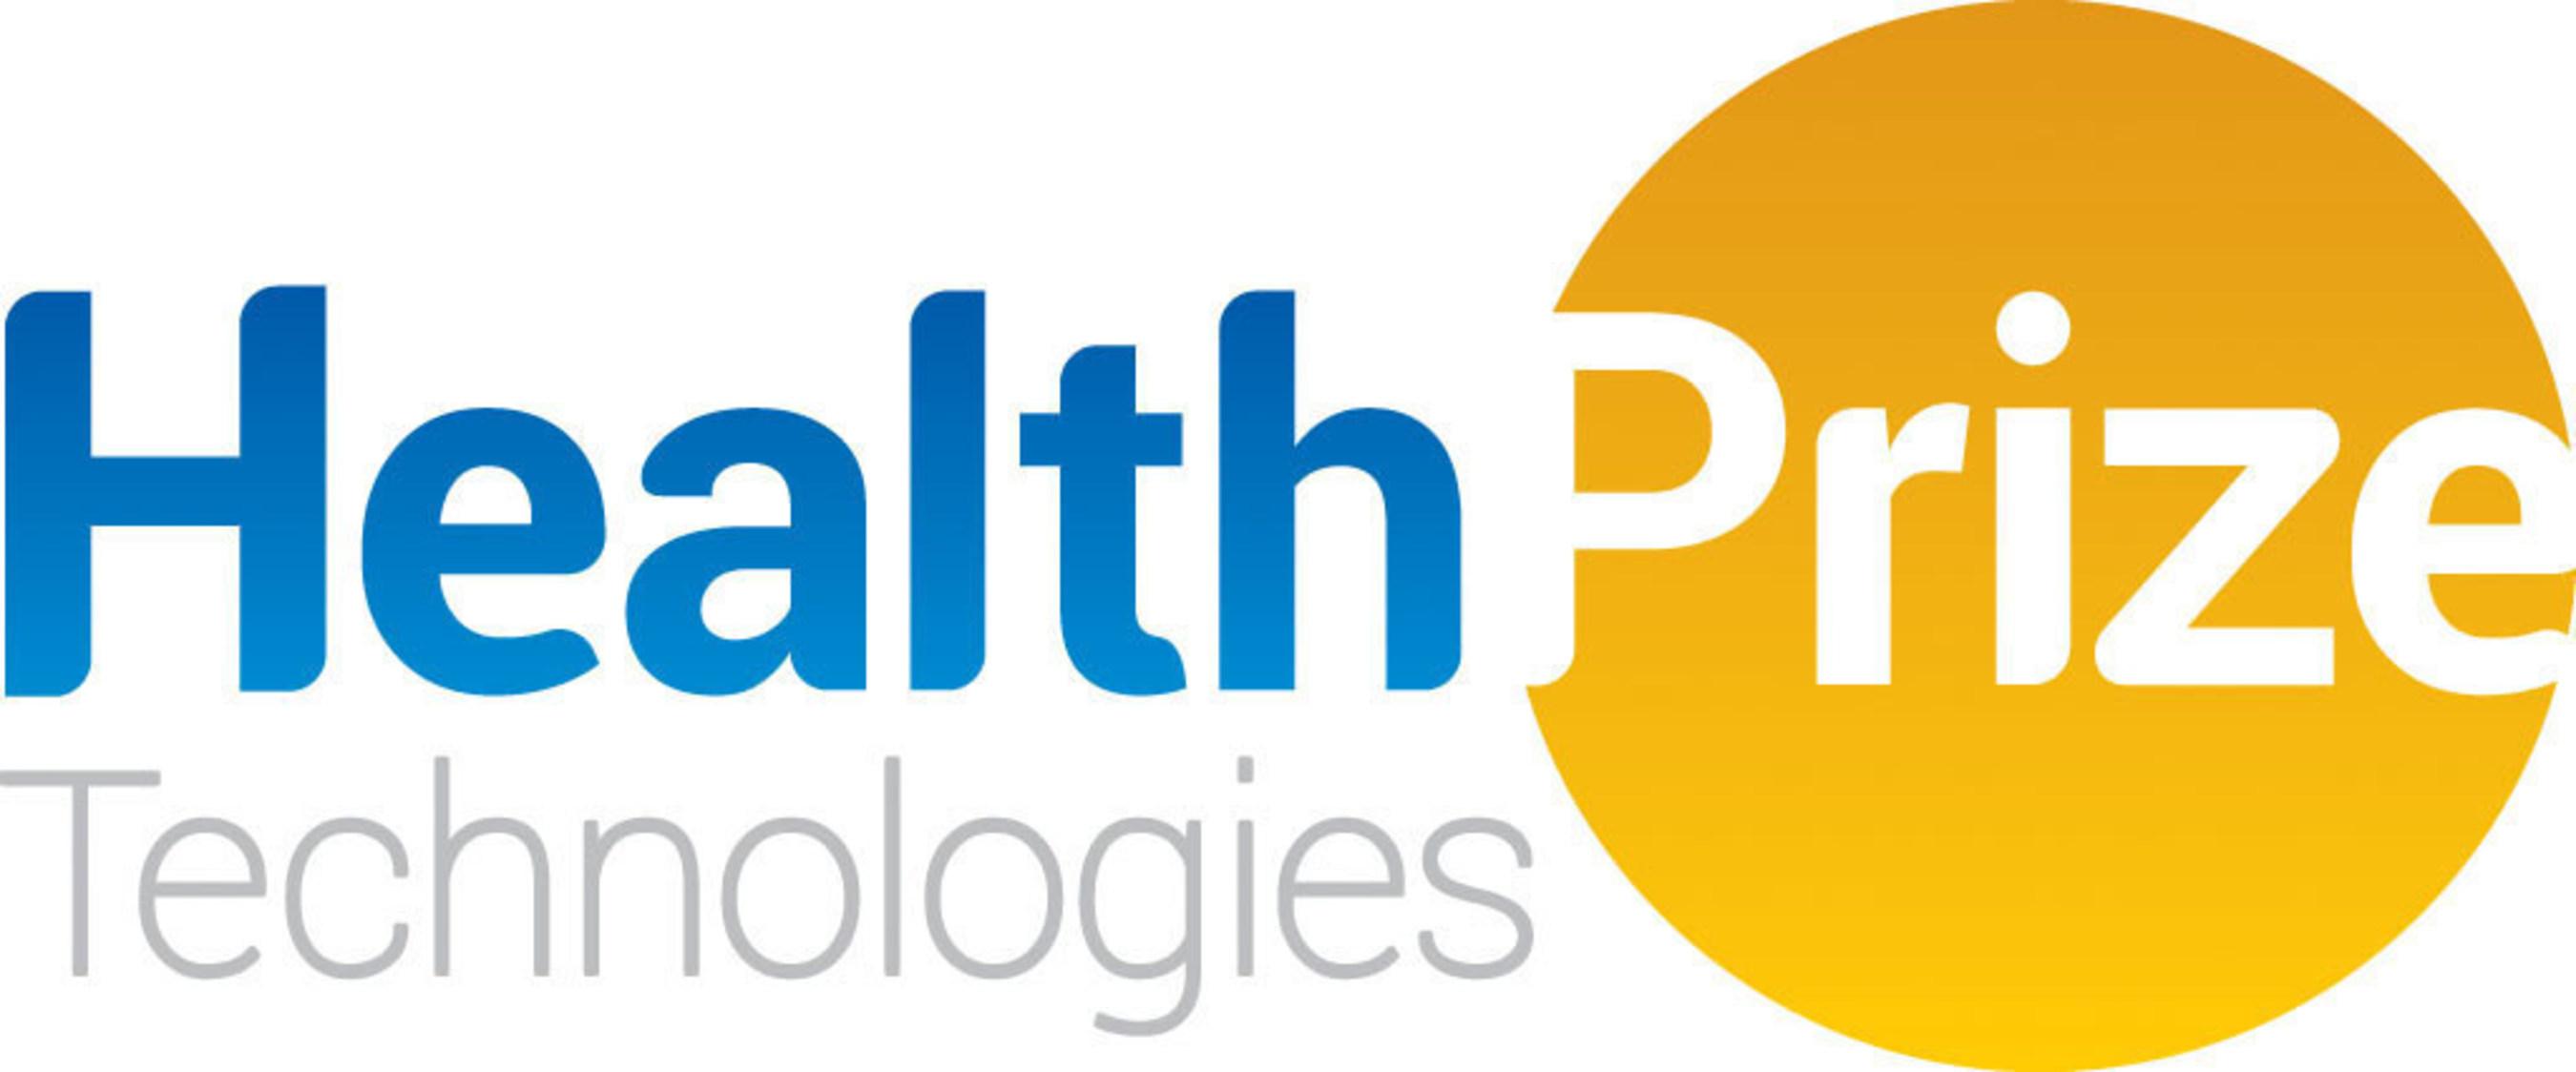 HealthPrize Technologies Logo